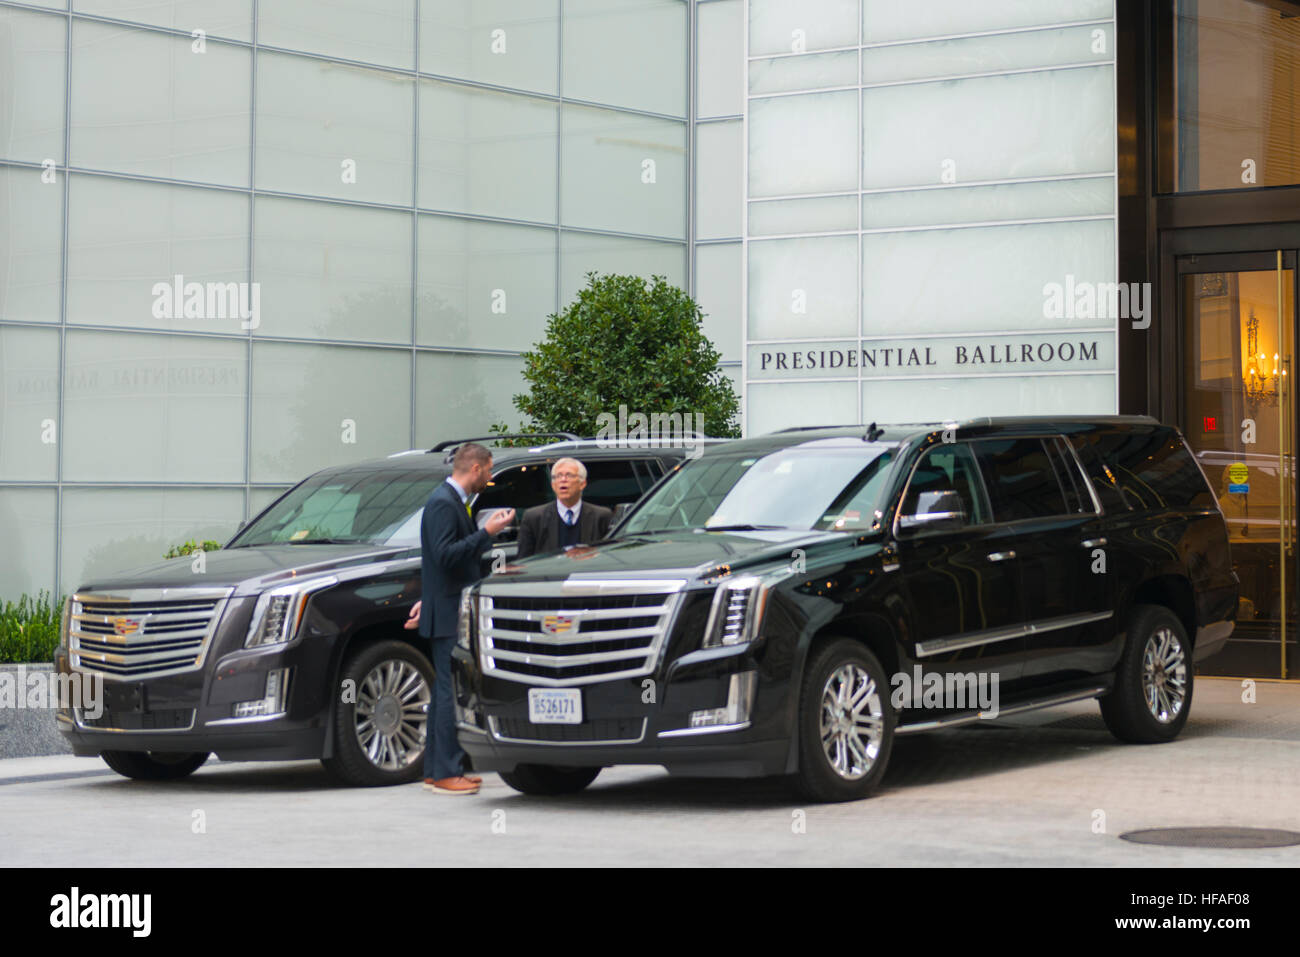 USA capital Washington DC District of Columbia side entrance Presidential Ballroom Trump International Hotel chauffeurs - Stock Image